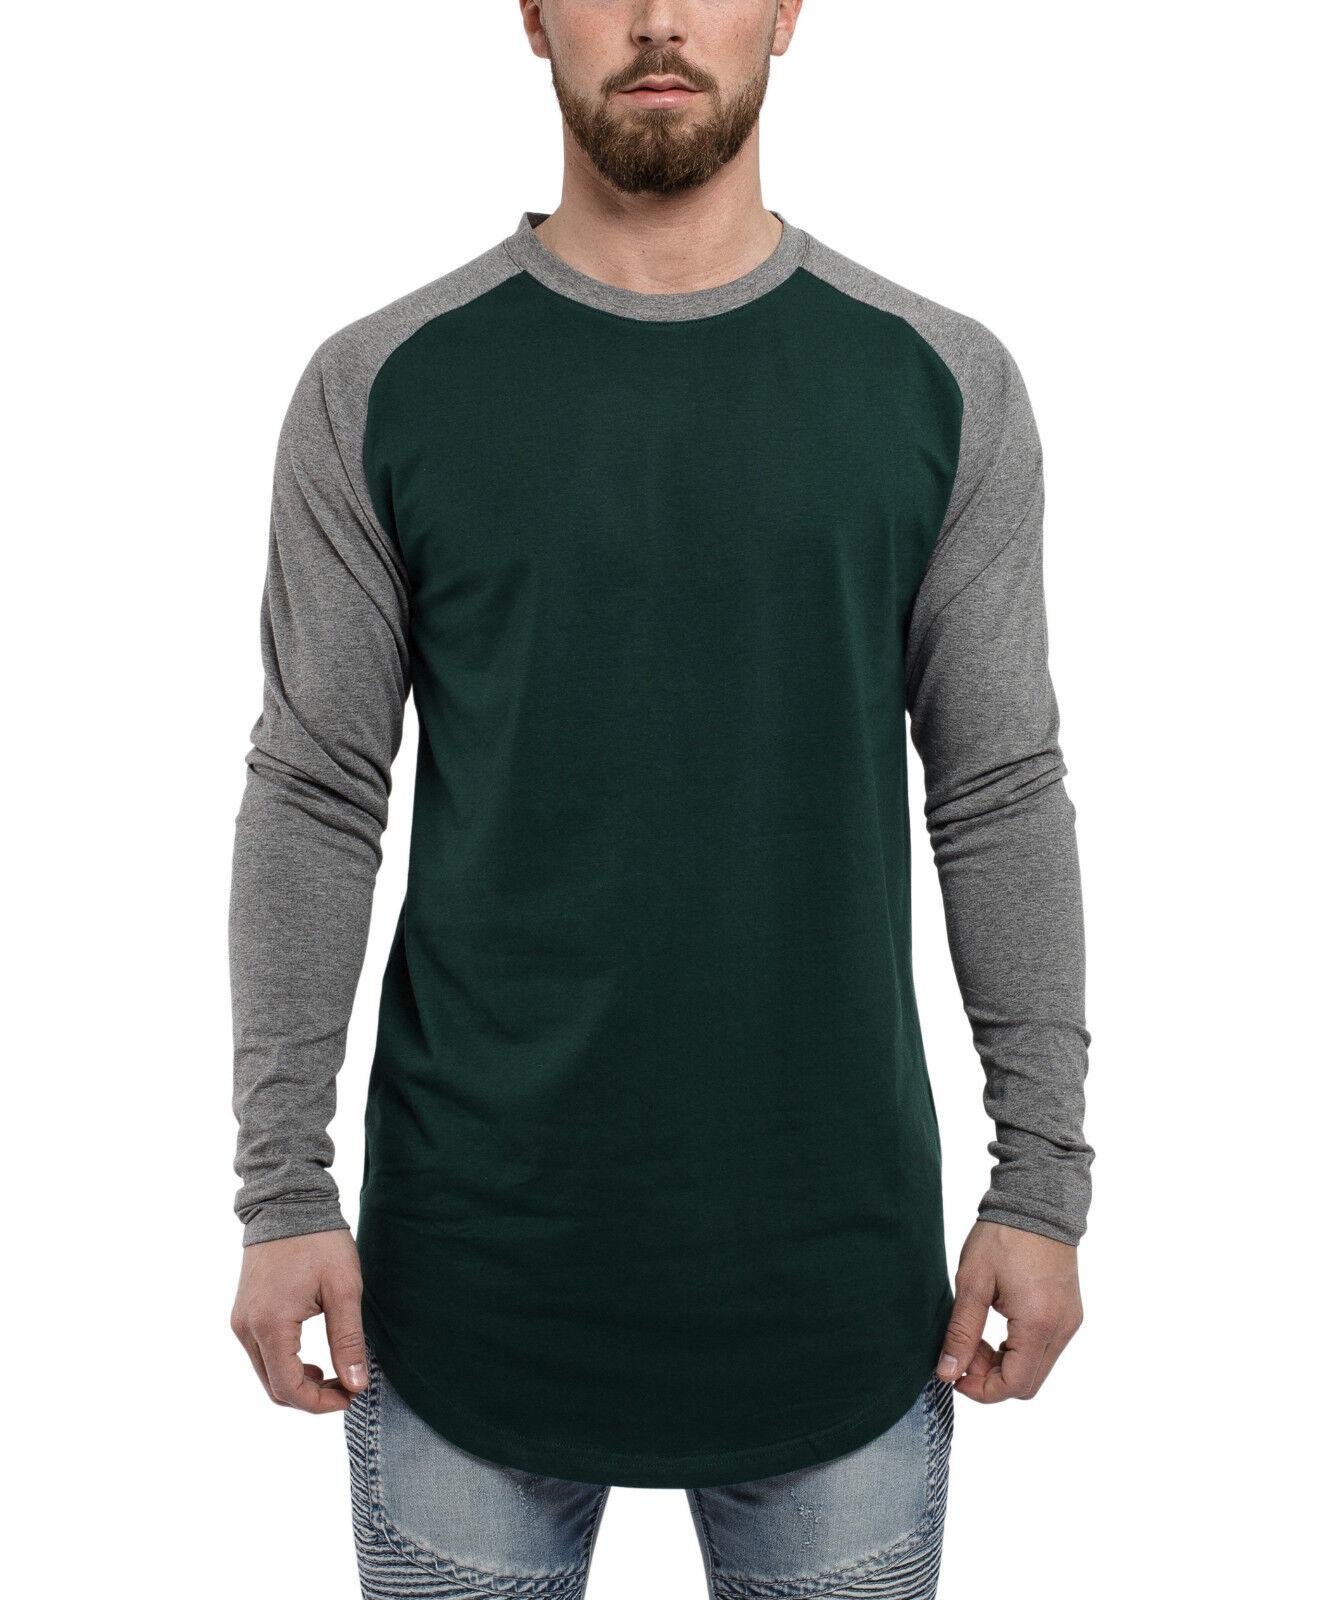 Blackskies Baseball T-Shirt Longshirt Grün Grau Longline Herren Basic Langes Tee